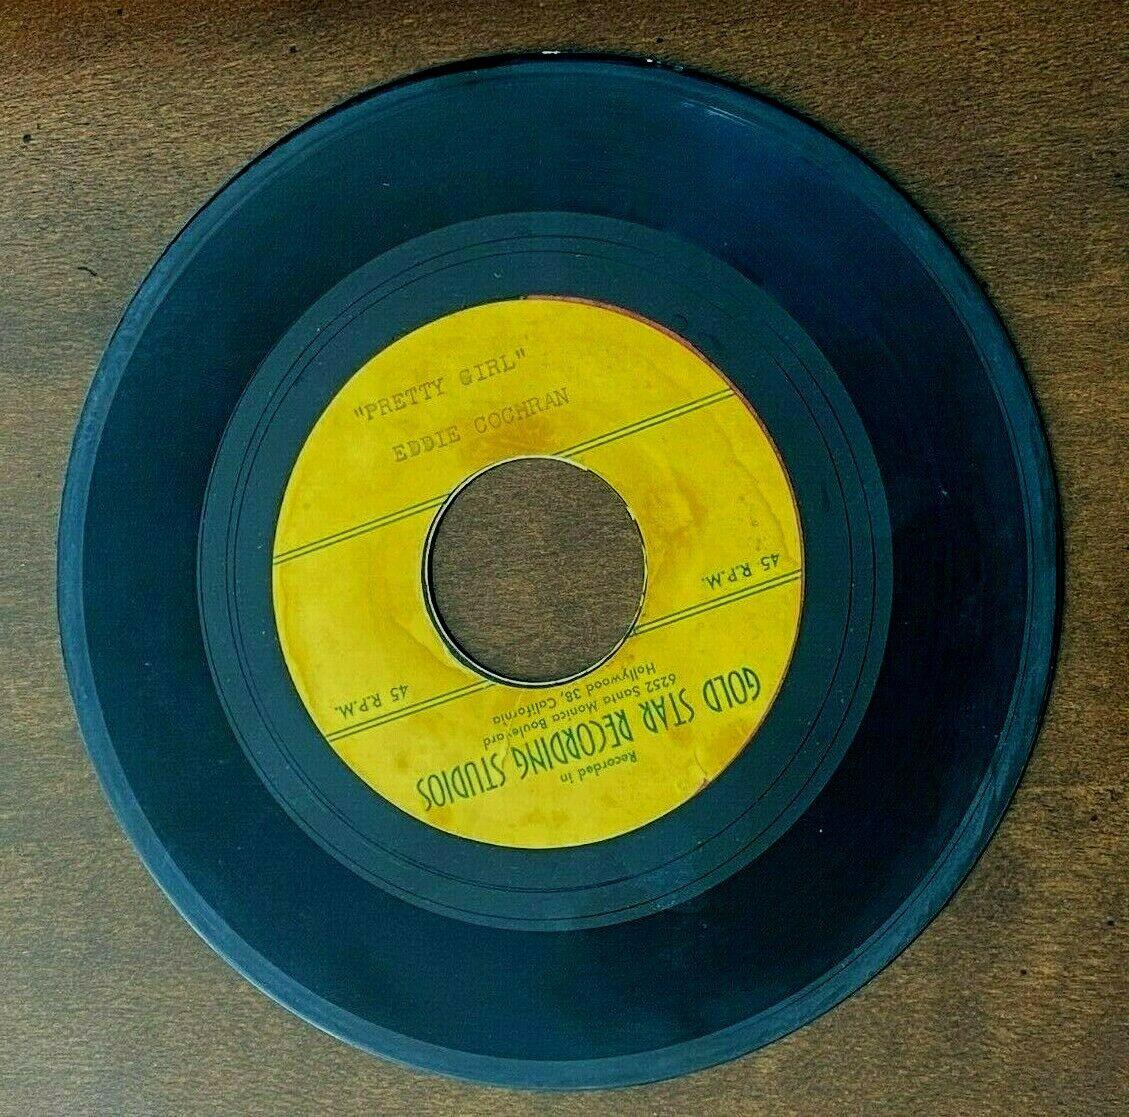 EDDIE COCHRAN 7  Acetate Record  PRETTY GIRL GOLDSTAR RECORDS RARE ROCK n ROLL